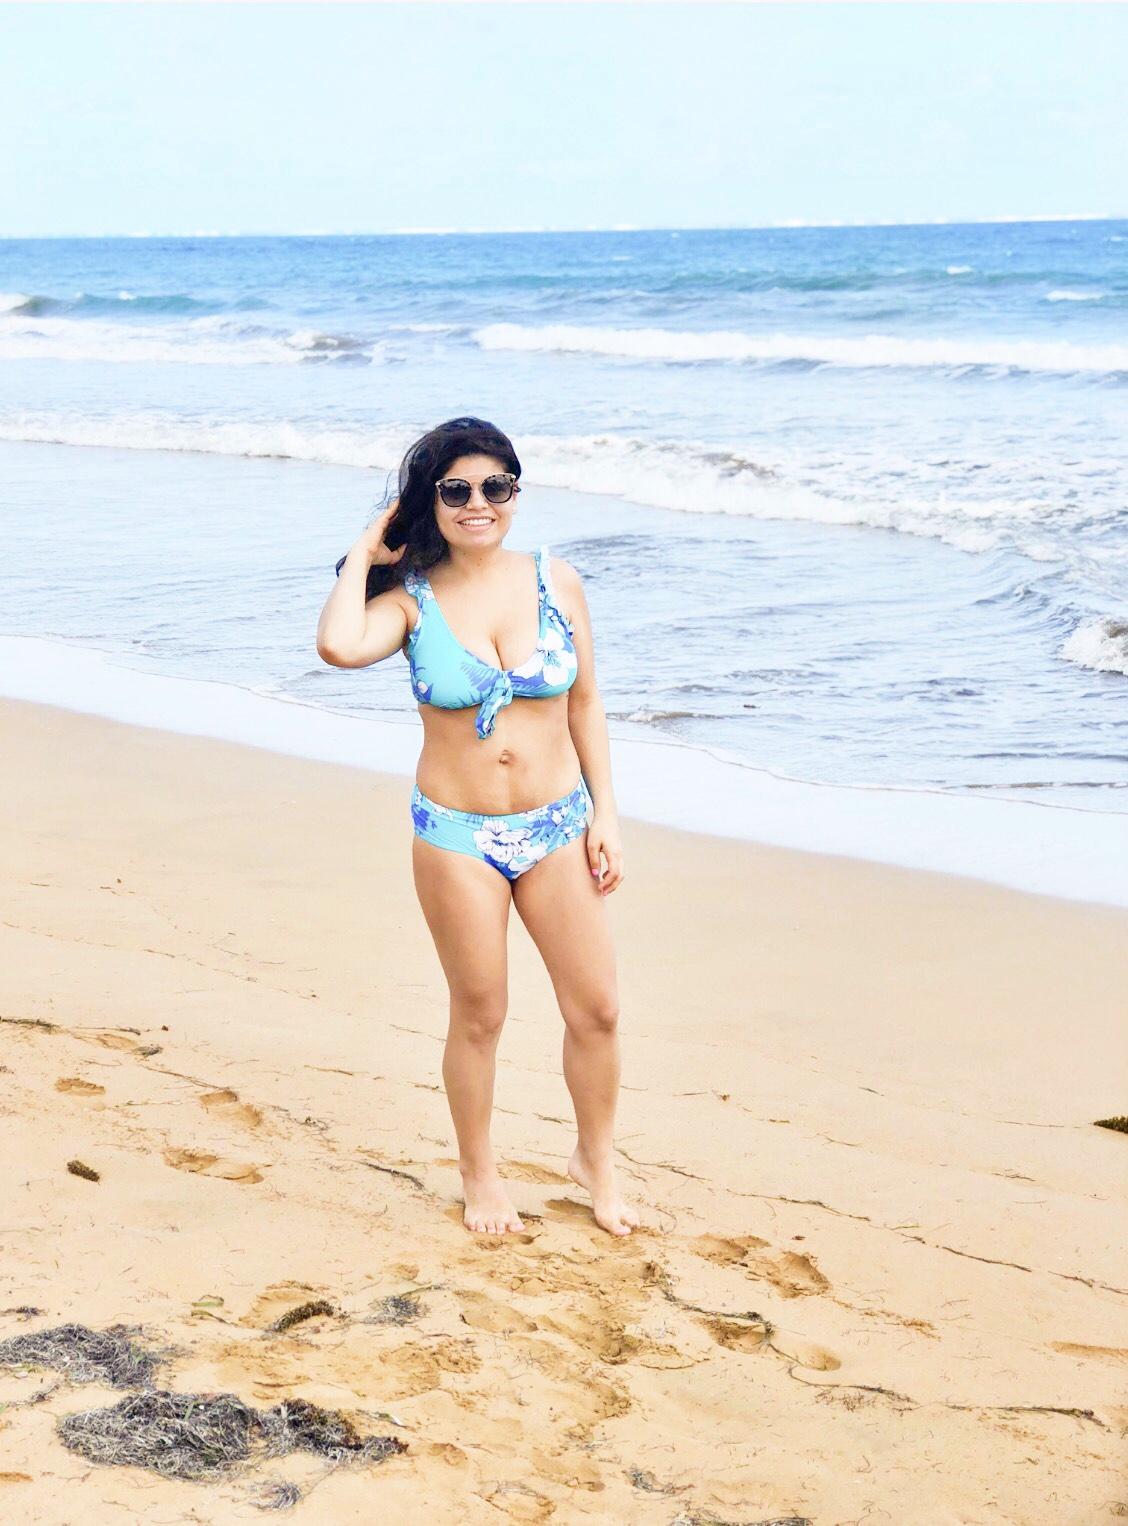 Mom bod, postpartum body, self love, motherhood, beach, swim sit